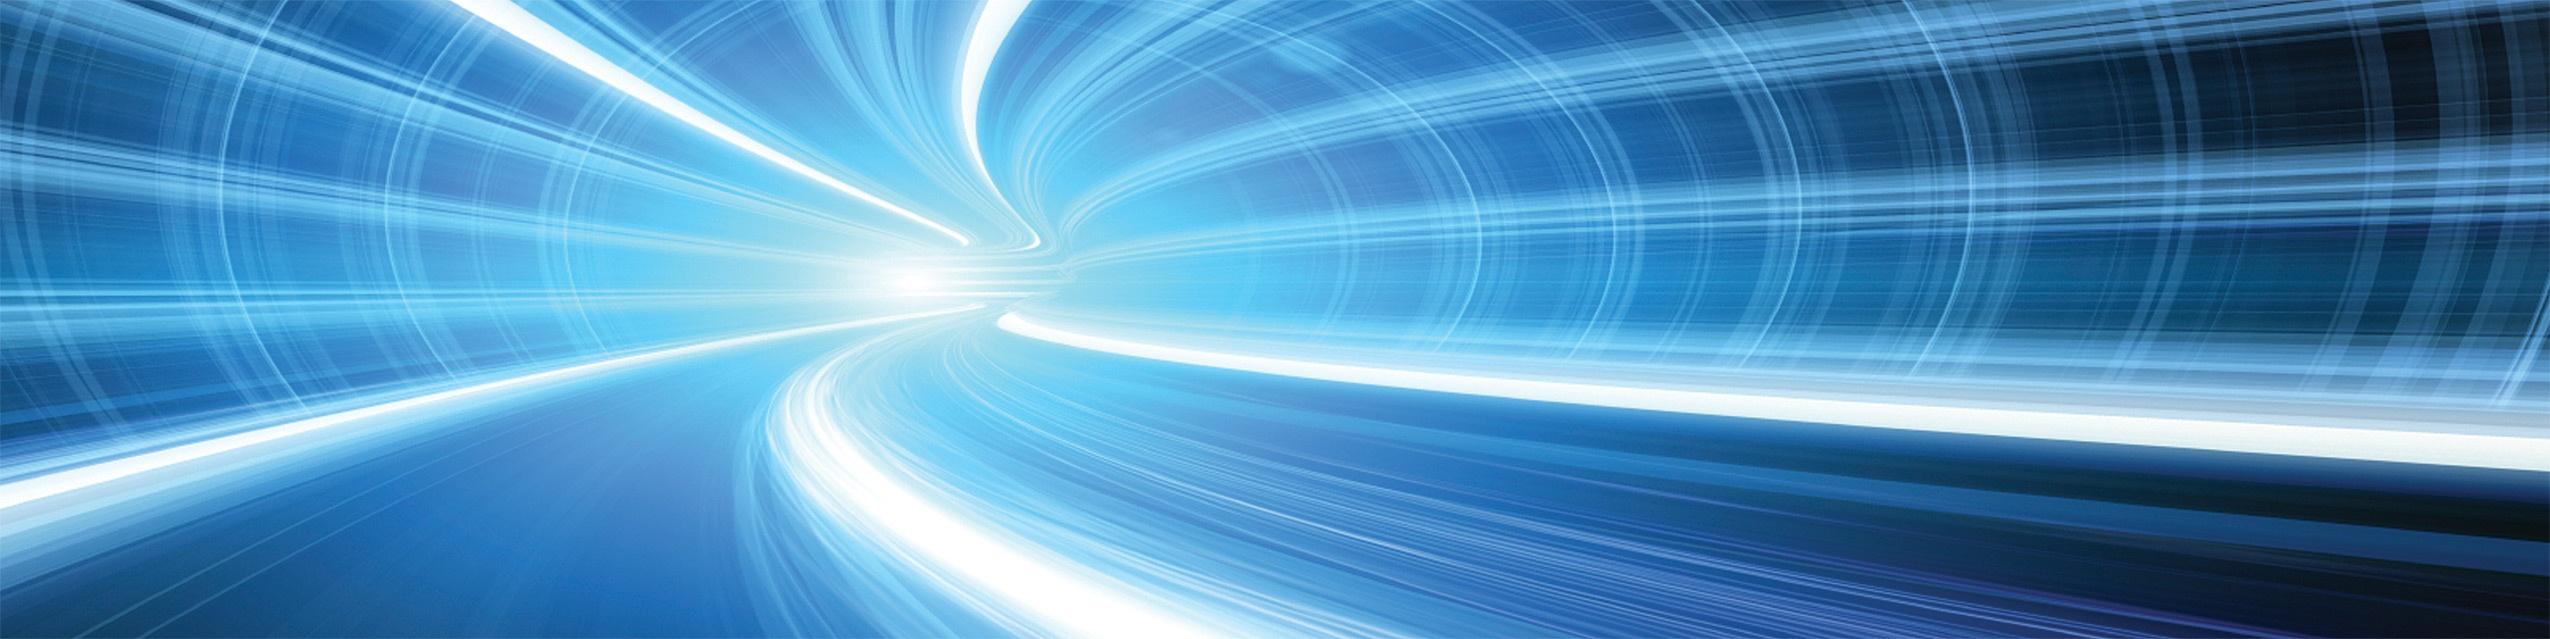 anttelecom-blue-background.jpg